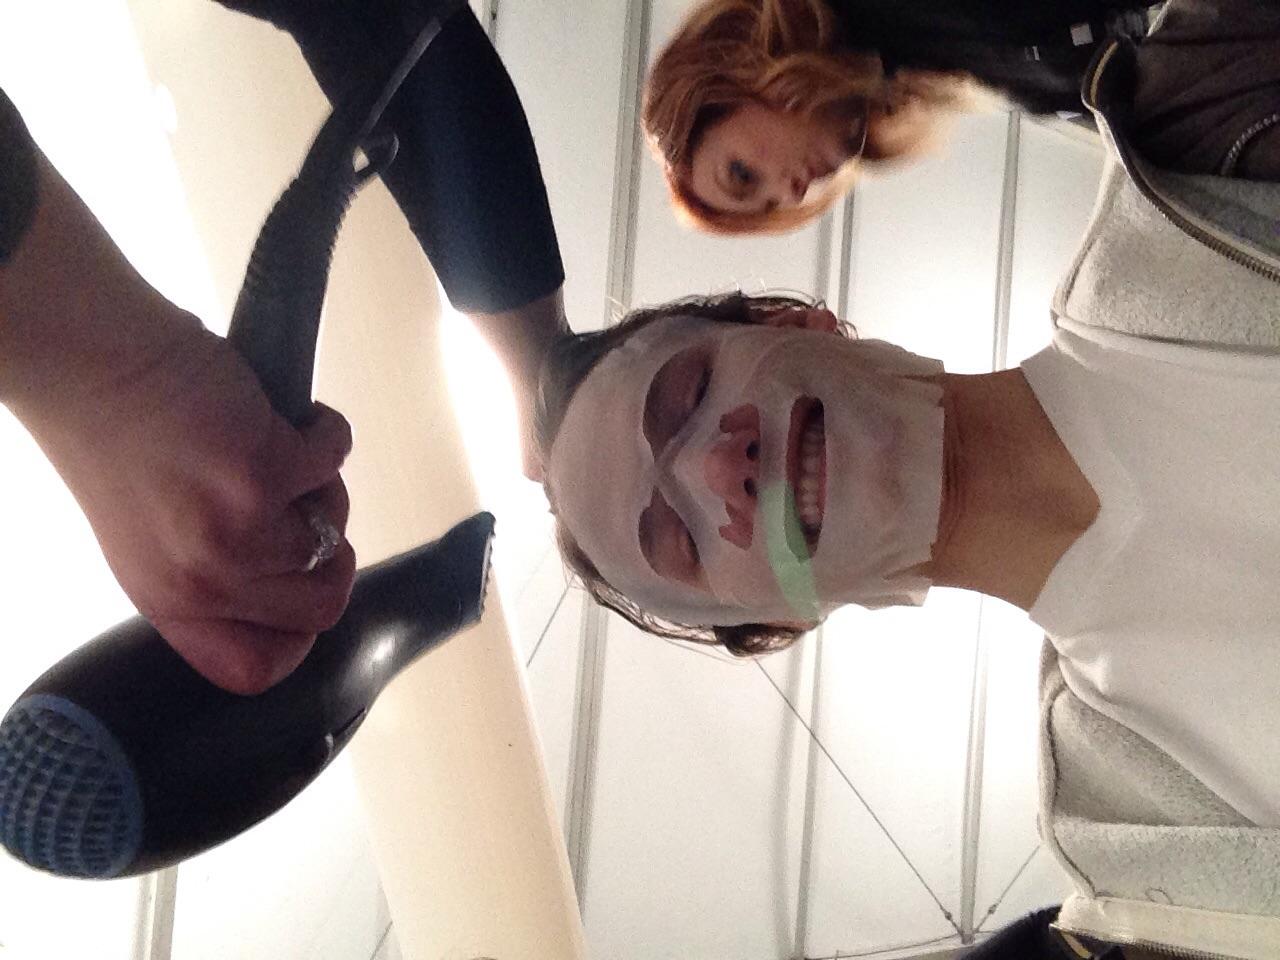 Ryan backstage during fashion week | Want Management